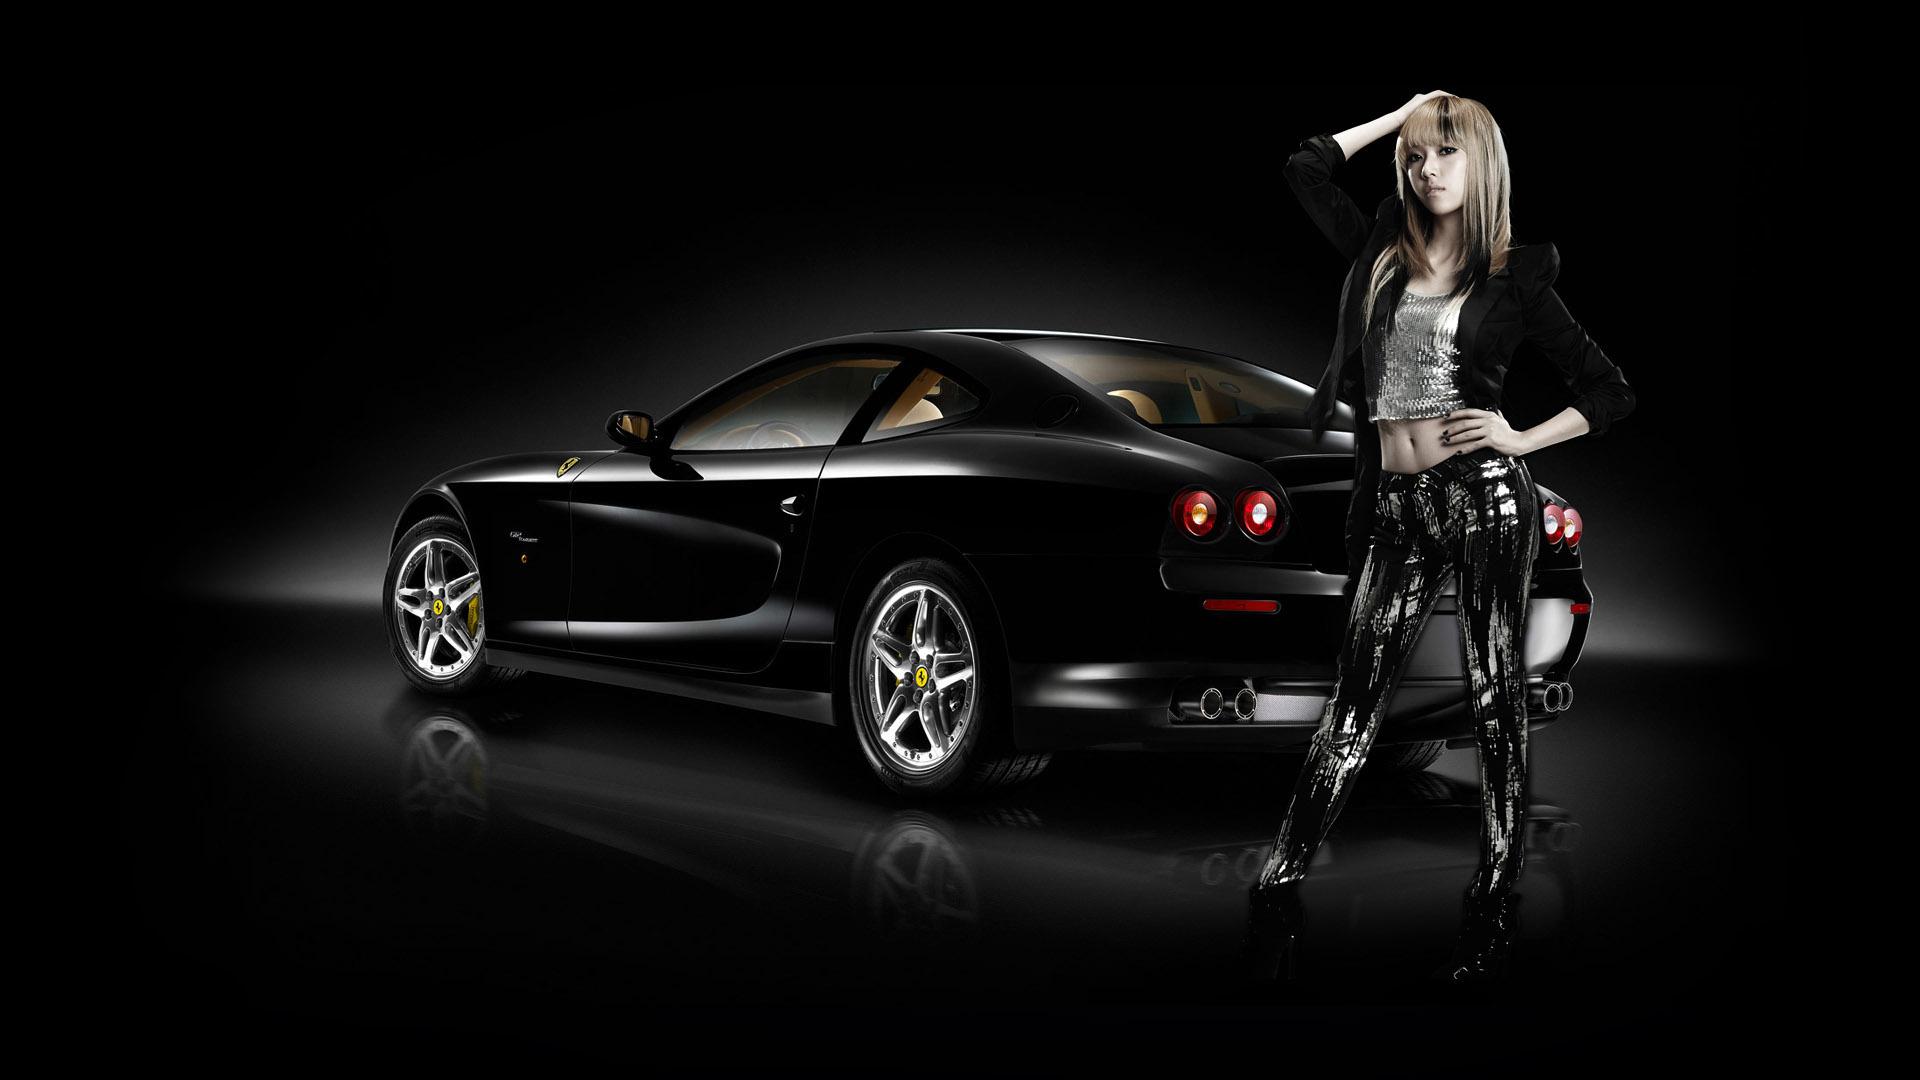 Black Hot Cars Wallpaper 29 Desktop Wallpaper